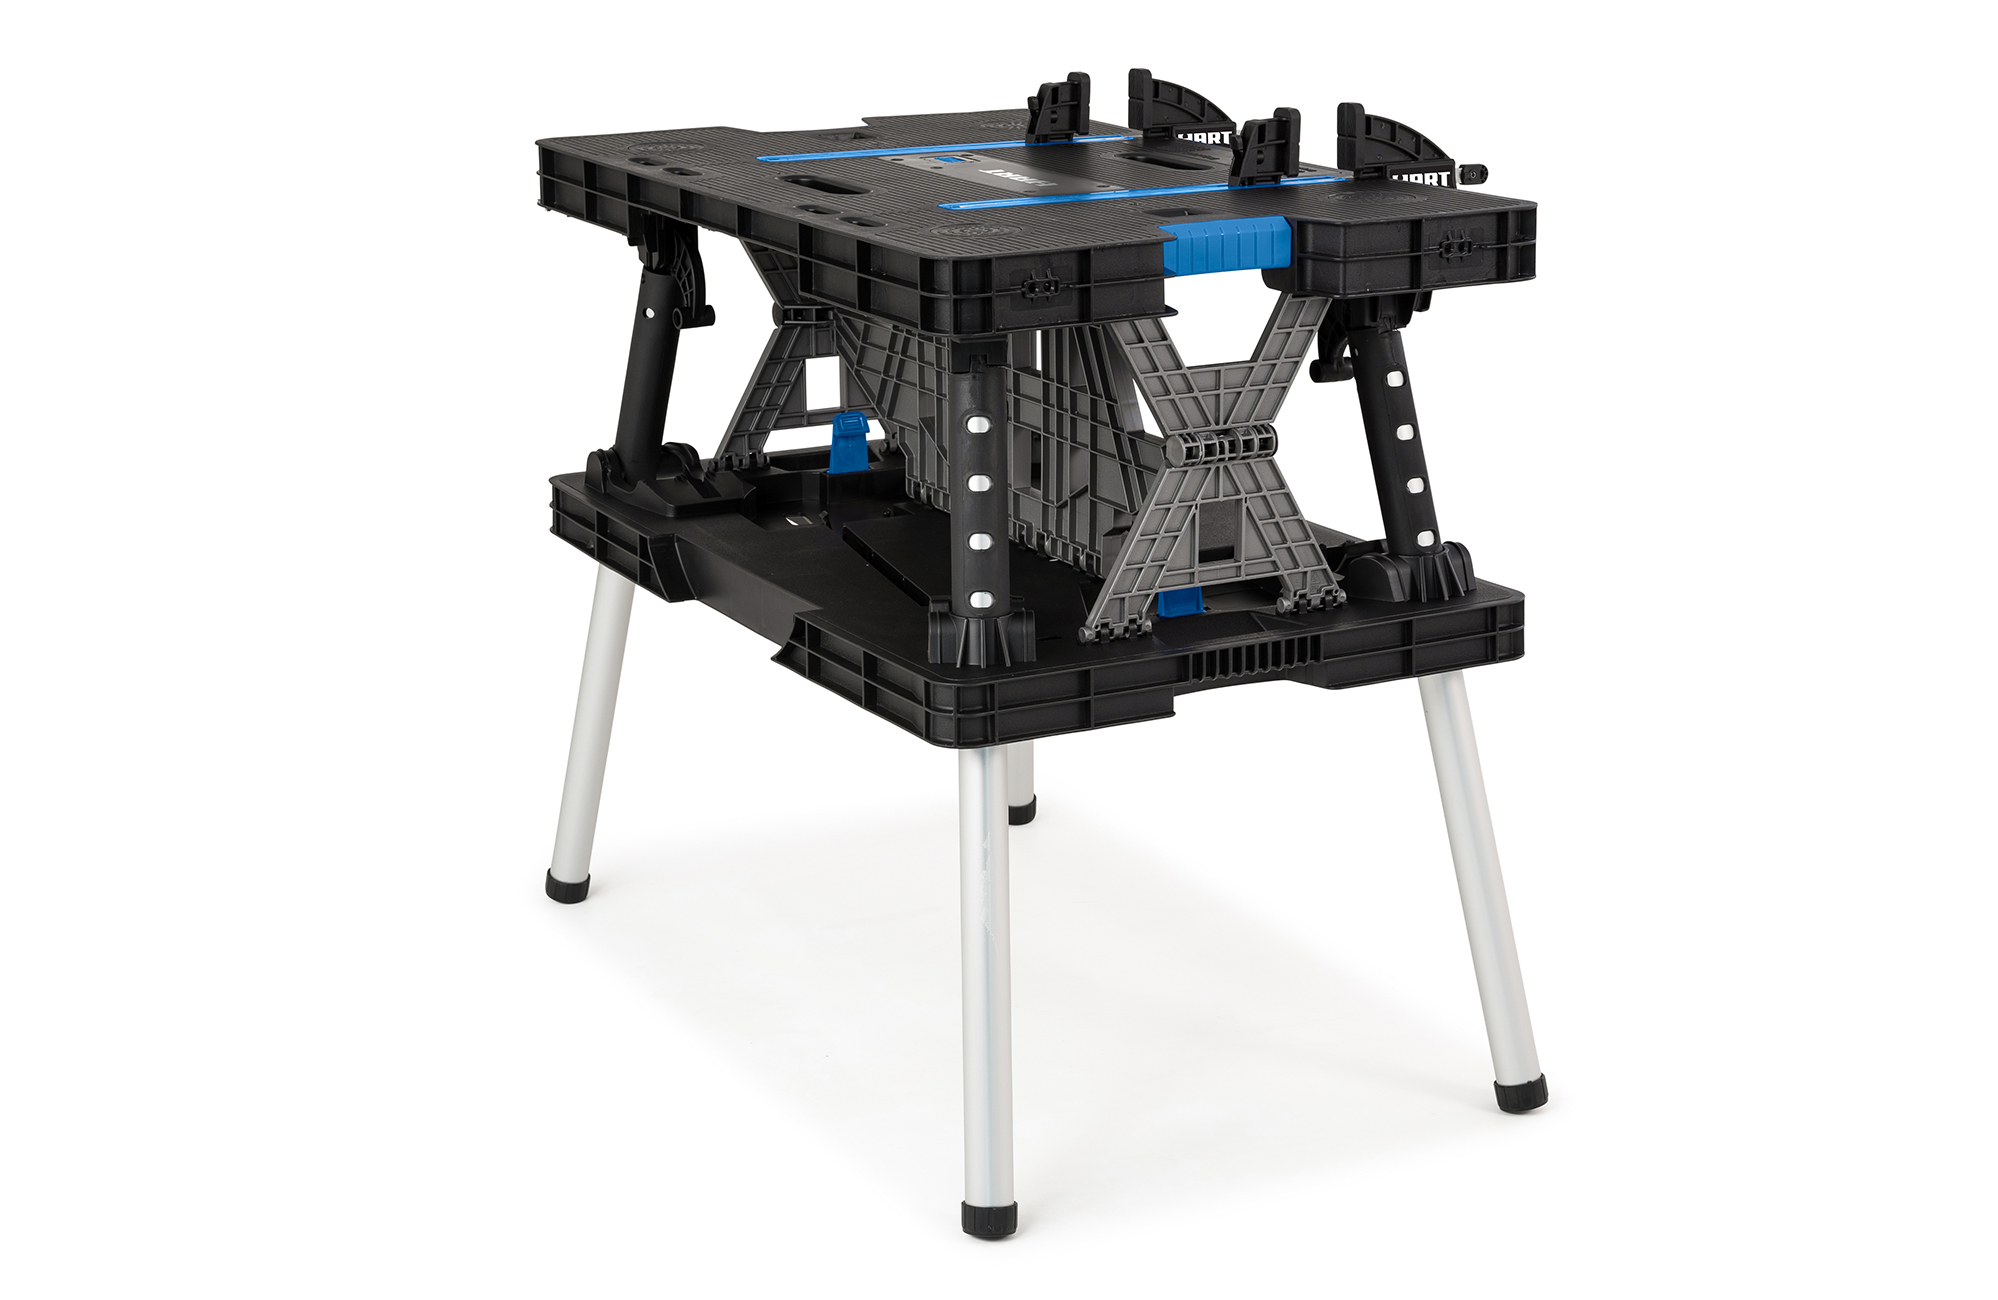 Hart Folding Work Table With Fixed Legs Resin Workbench Black With Blue Walmart Com Walmart Com